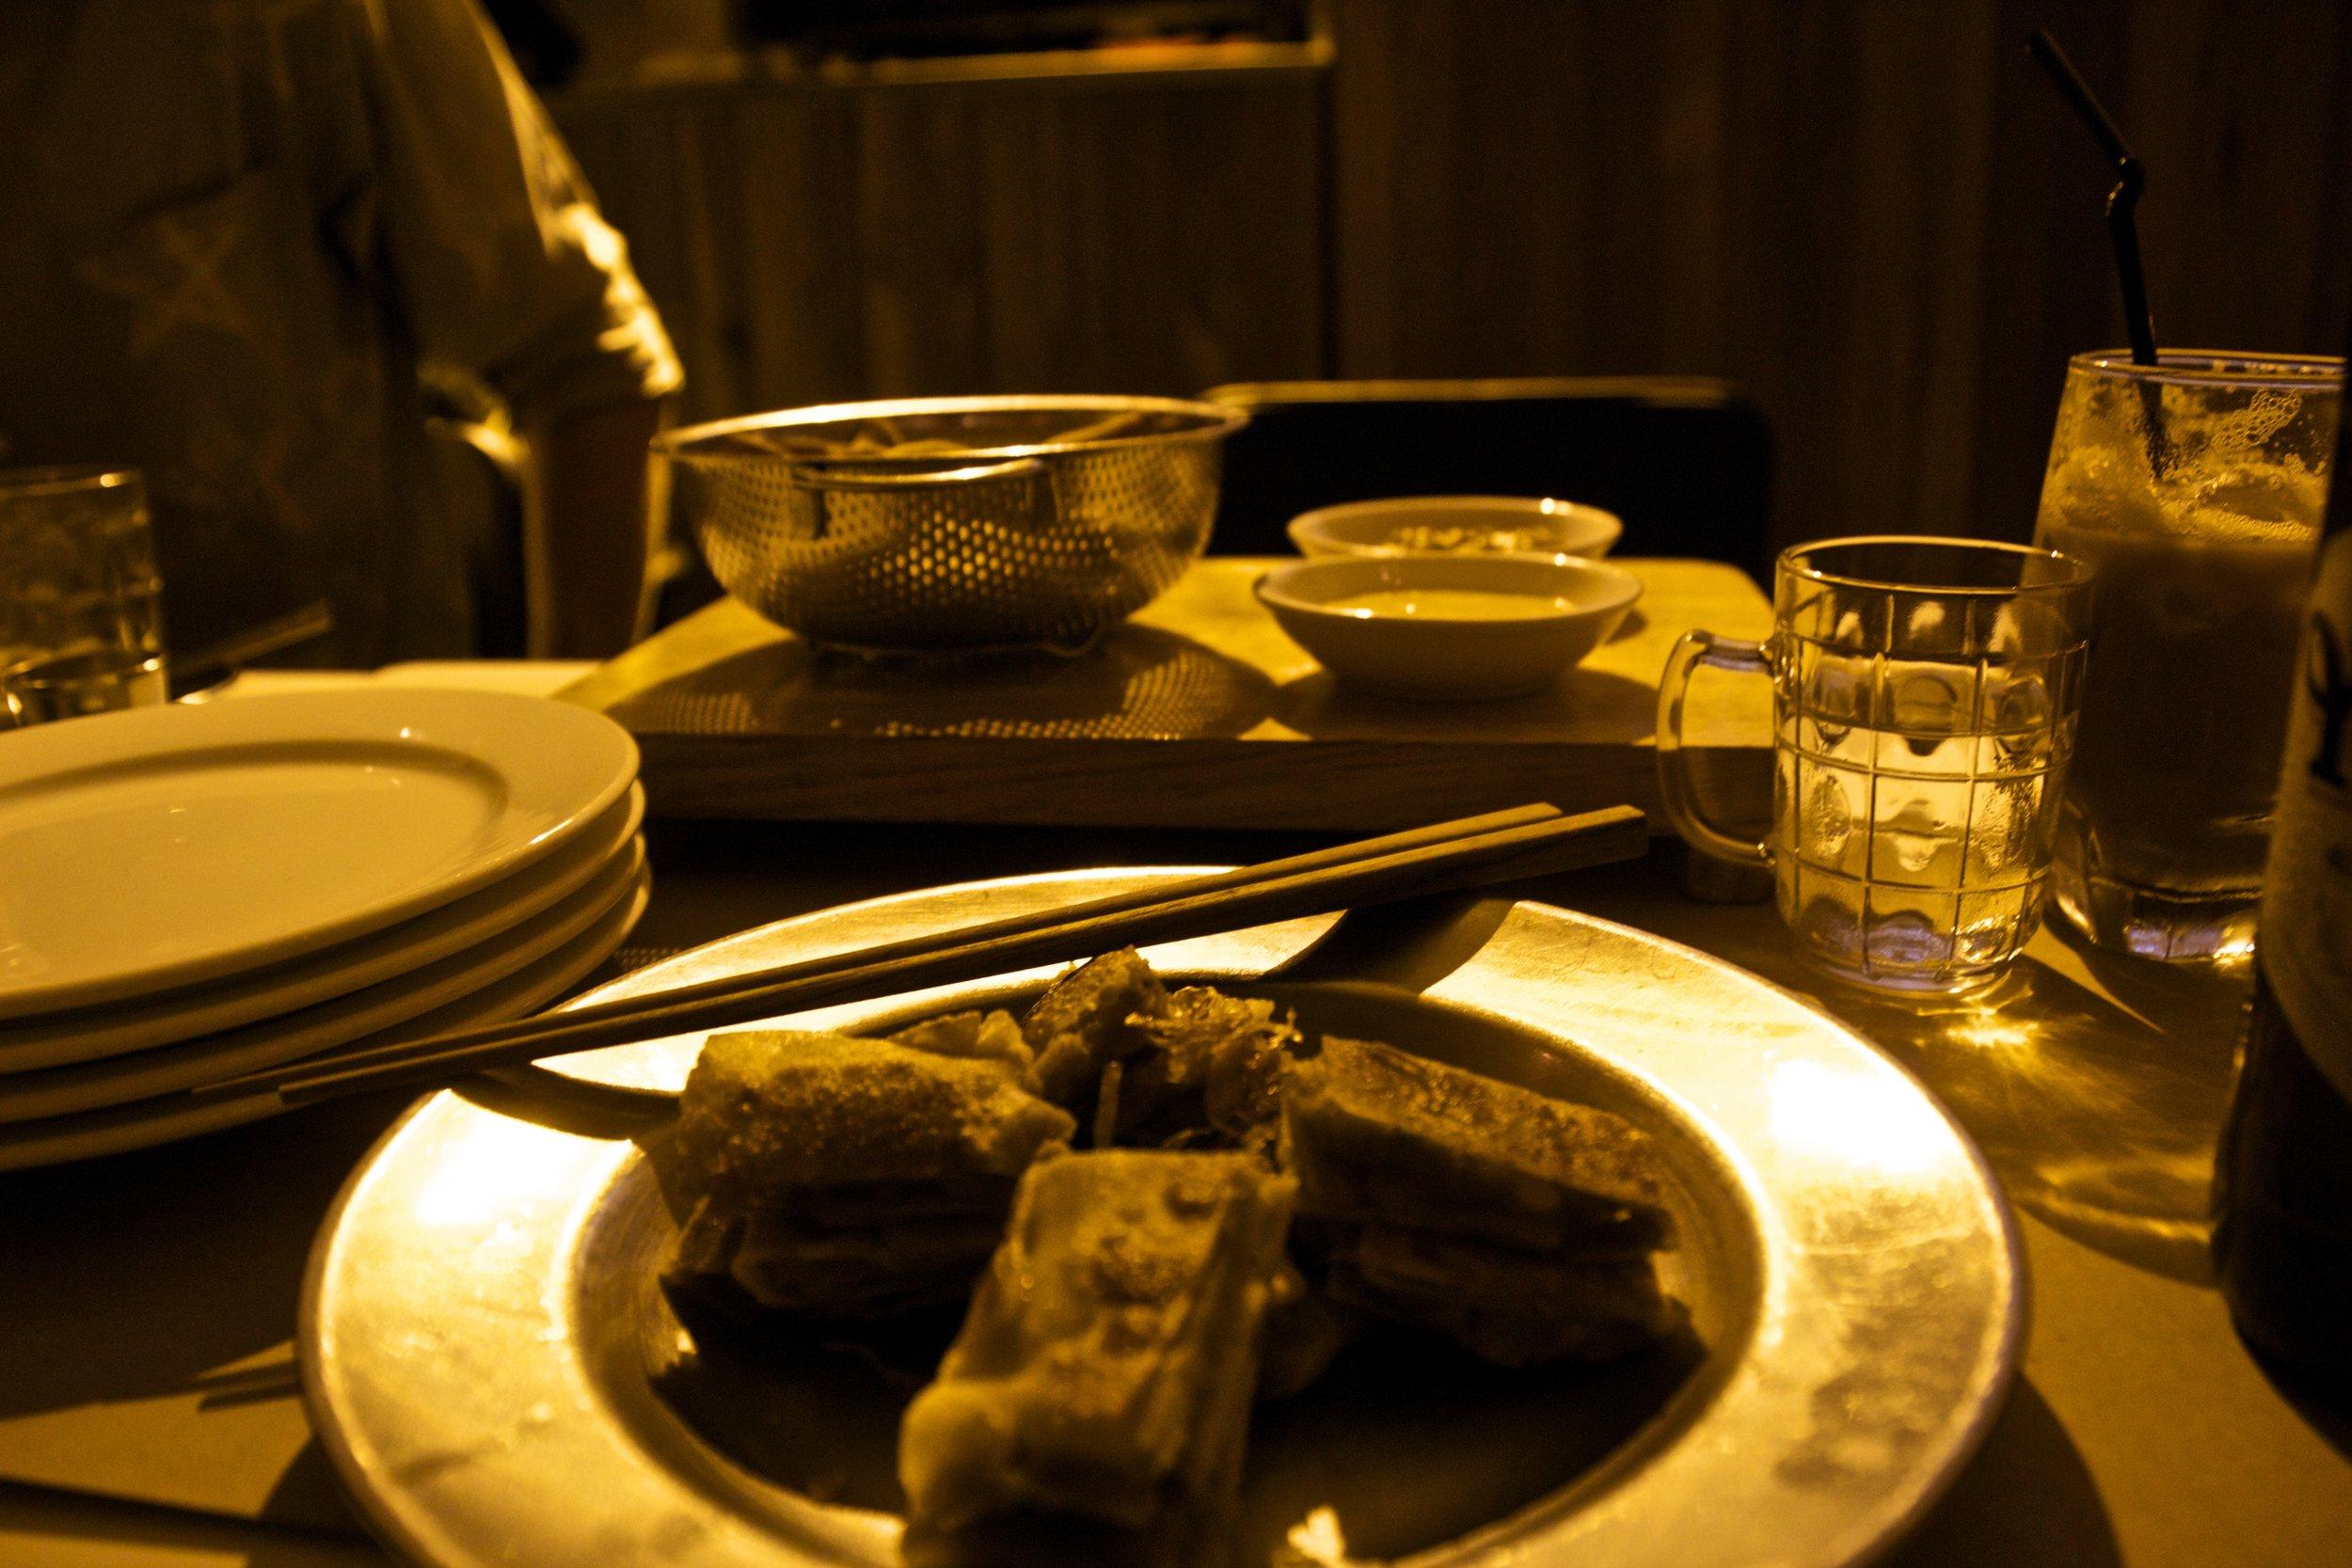 rangoon tea house restaurant yangon burma myanmar 1.jpg